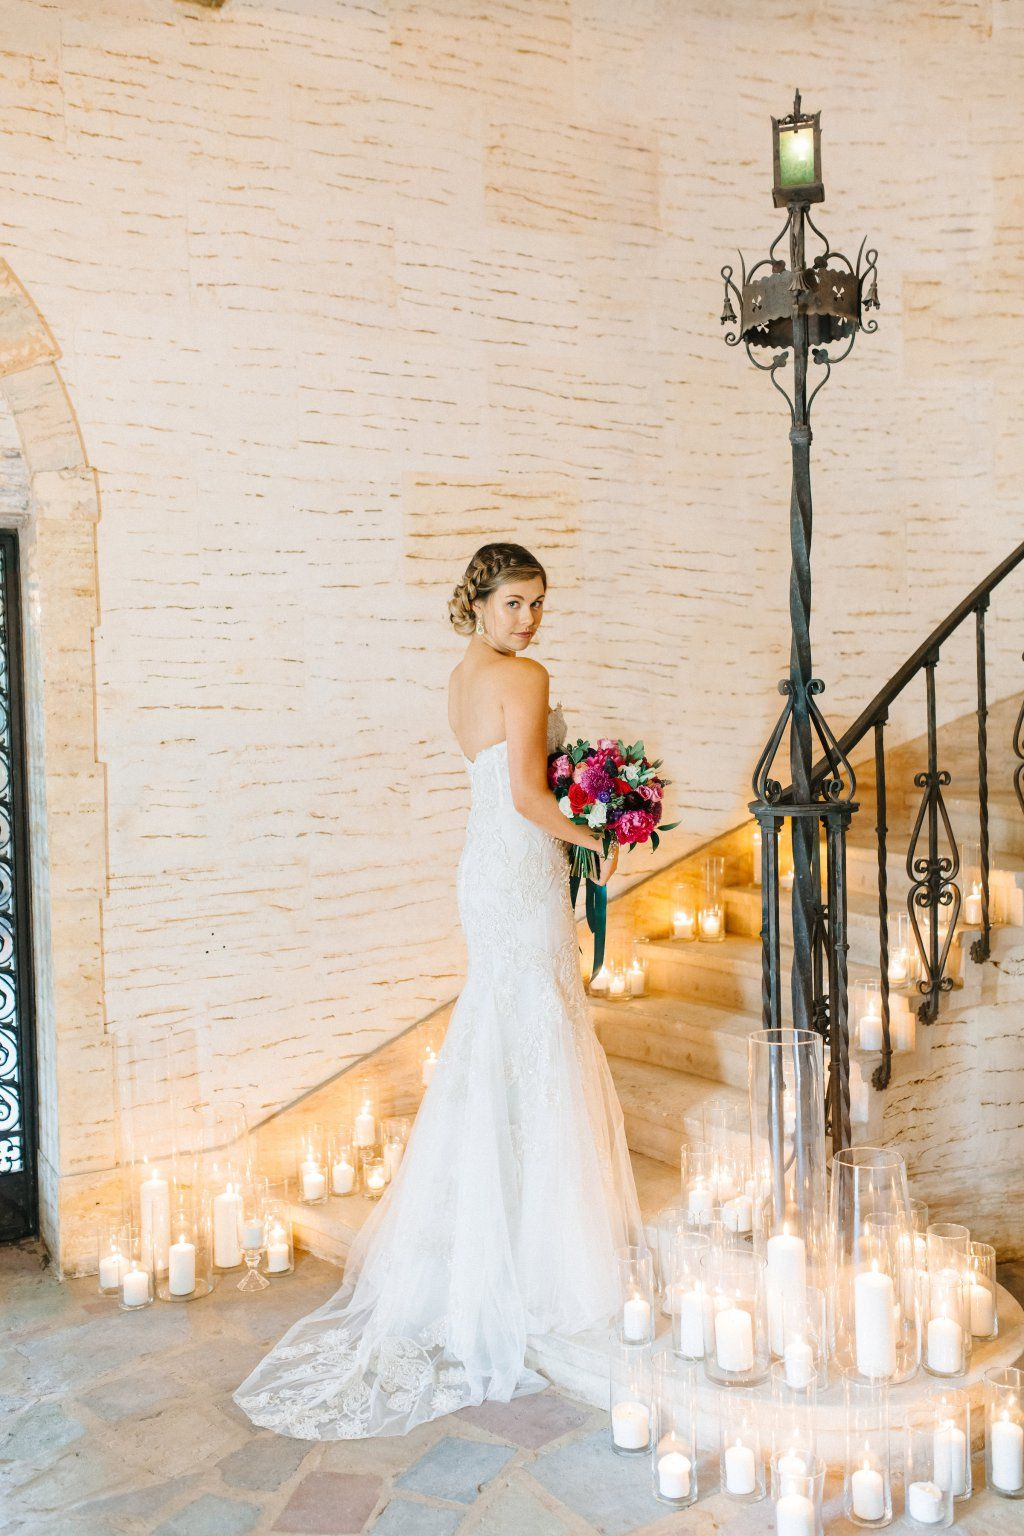 Jewel Tone Wedding Inspiration Plan It Events Orlando Wedding Planner Orlando Wedding Planner Orlando Wedding Wedding Rentals